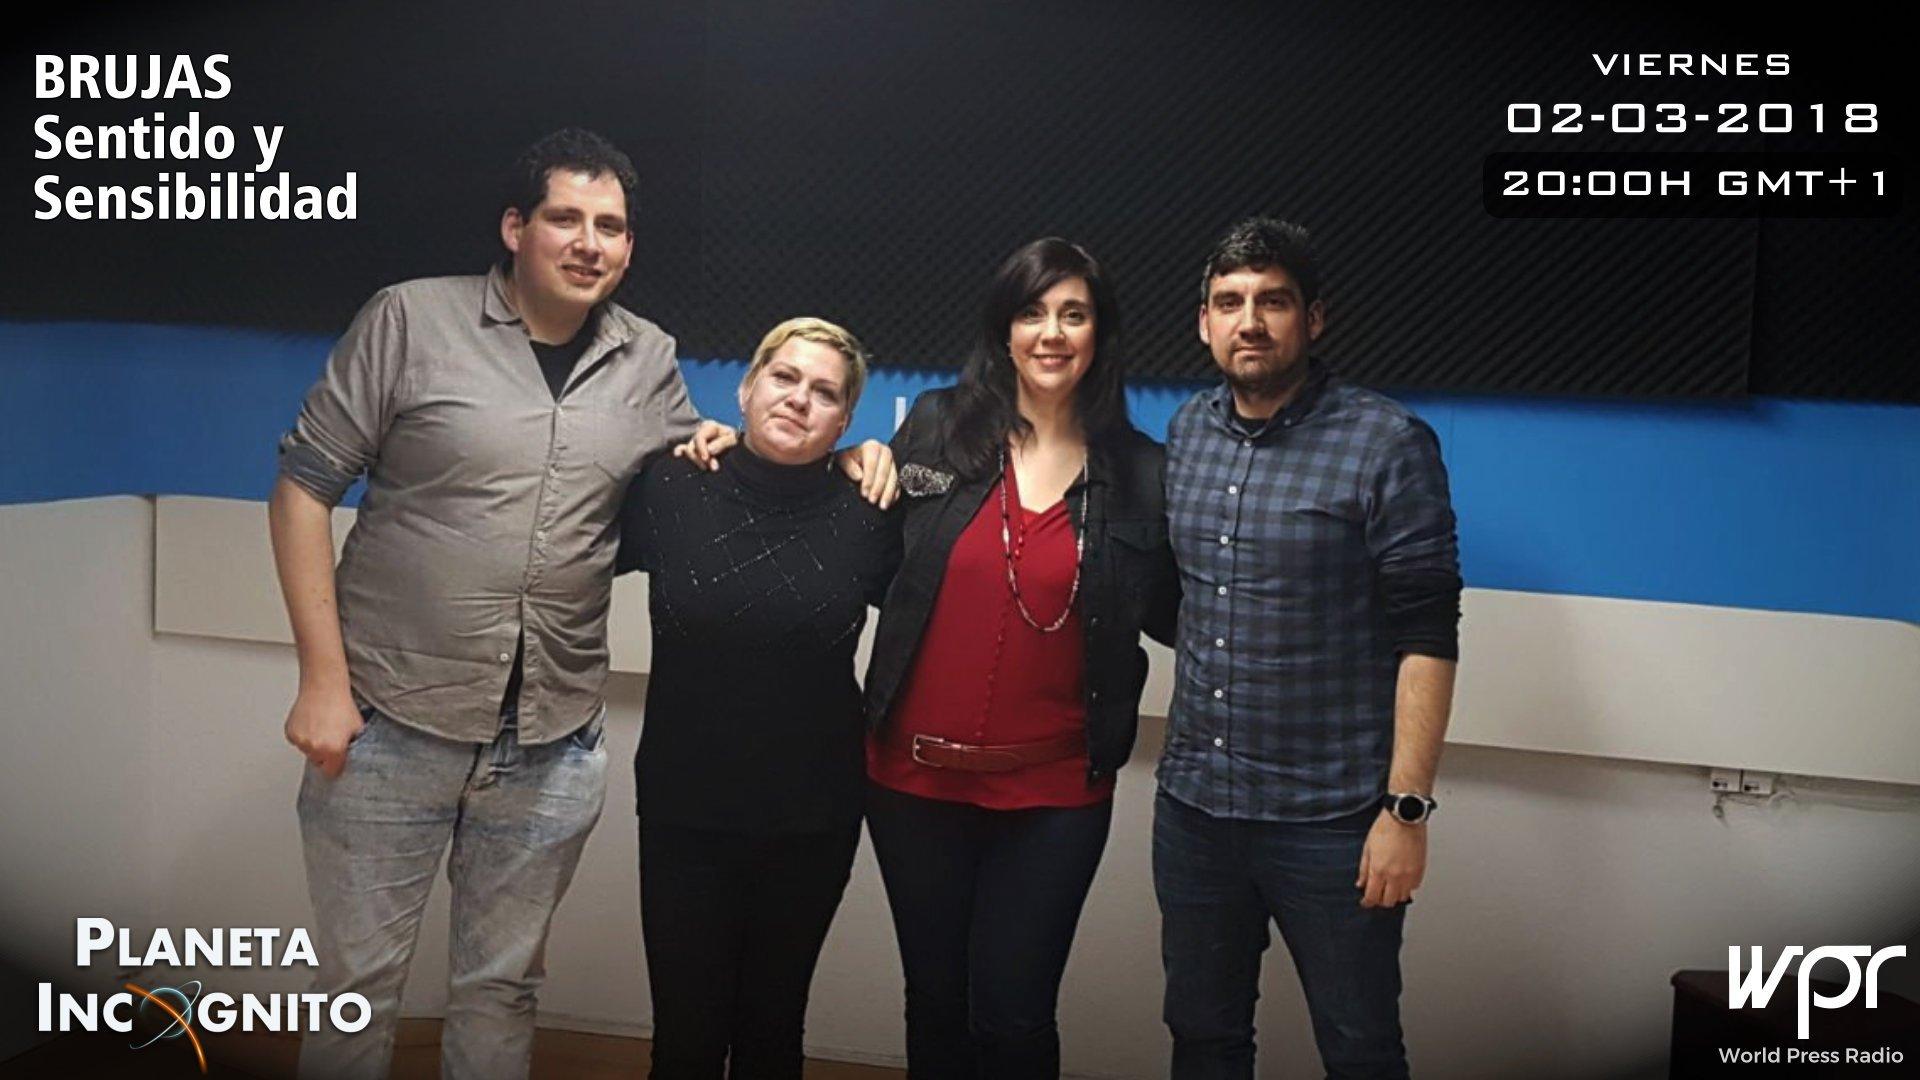 Episodio Brujas Sentido y sensibilidad, de izquierda a derecha Héctor Montoya, Mercedes Pullman, Cristina Menéndez e Iván Montoya